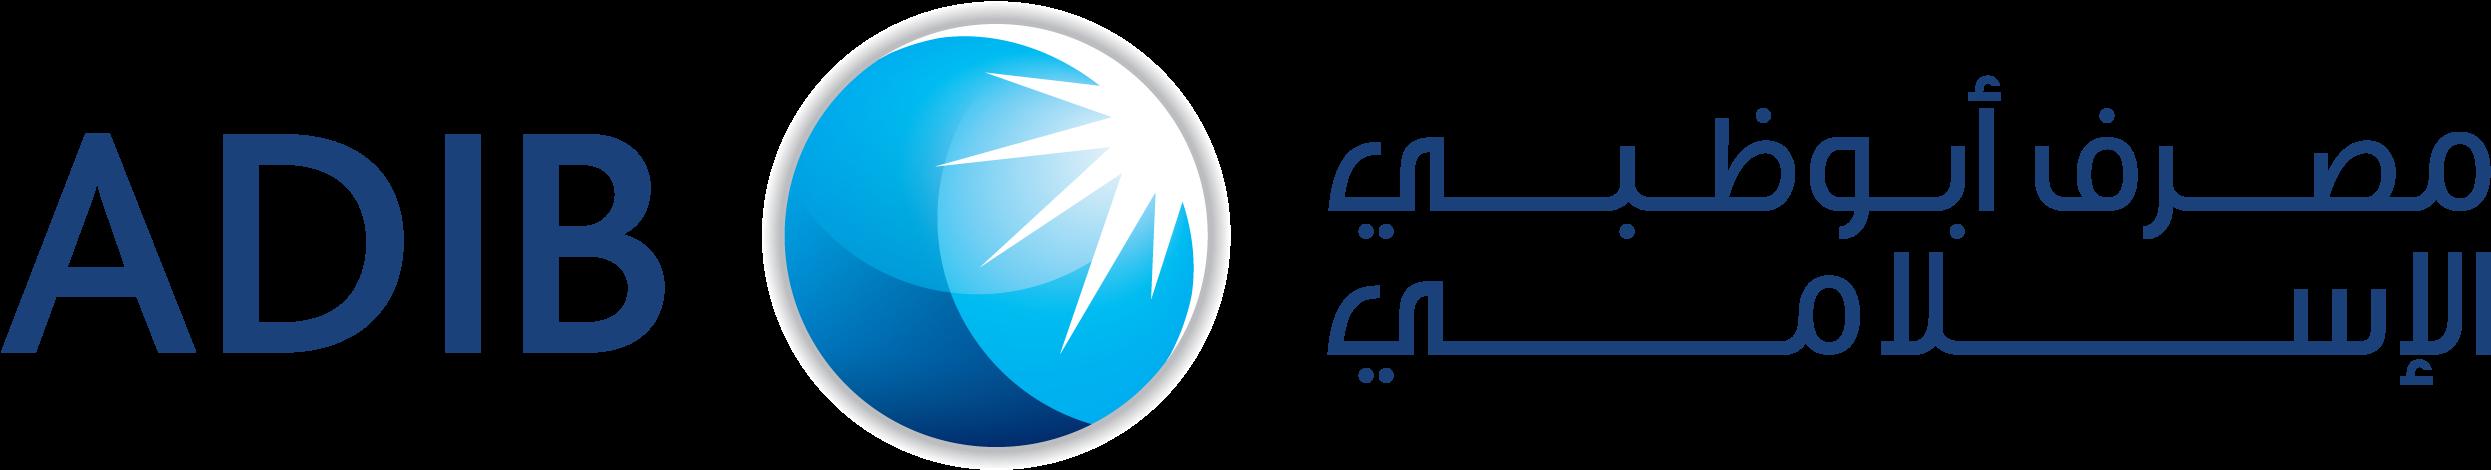 adib-egypt-logo